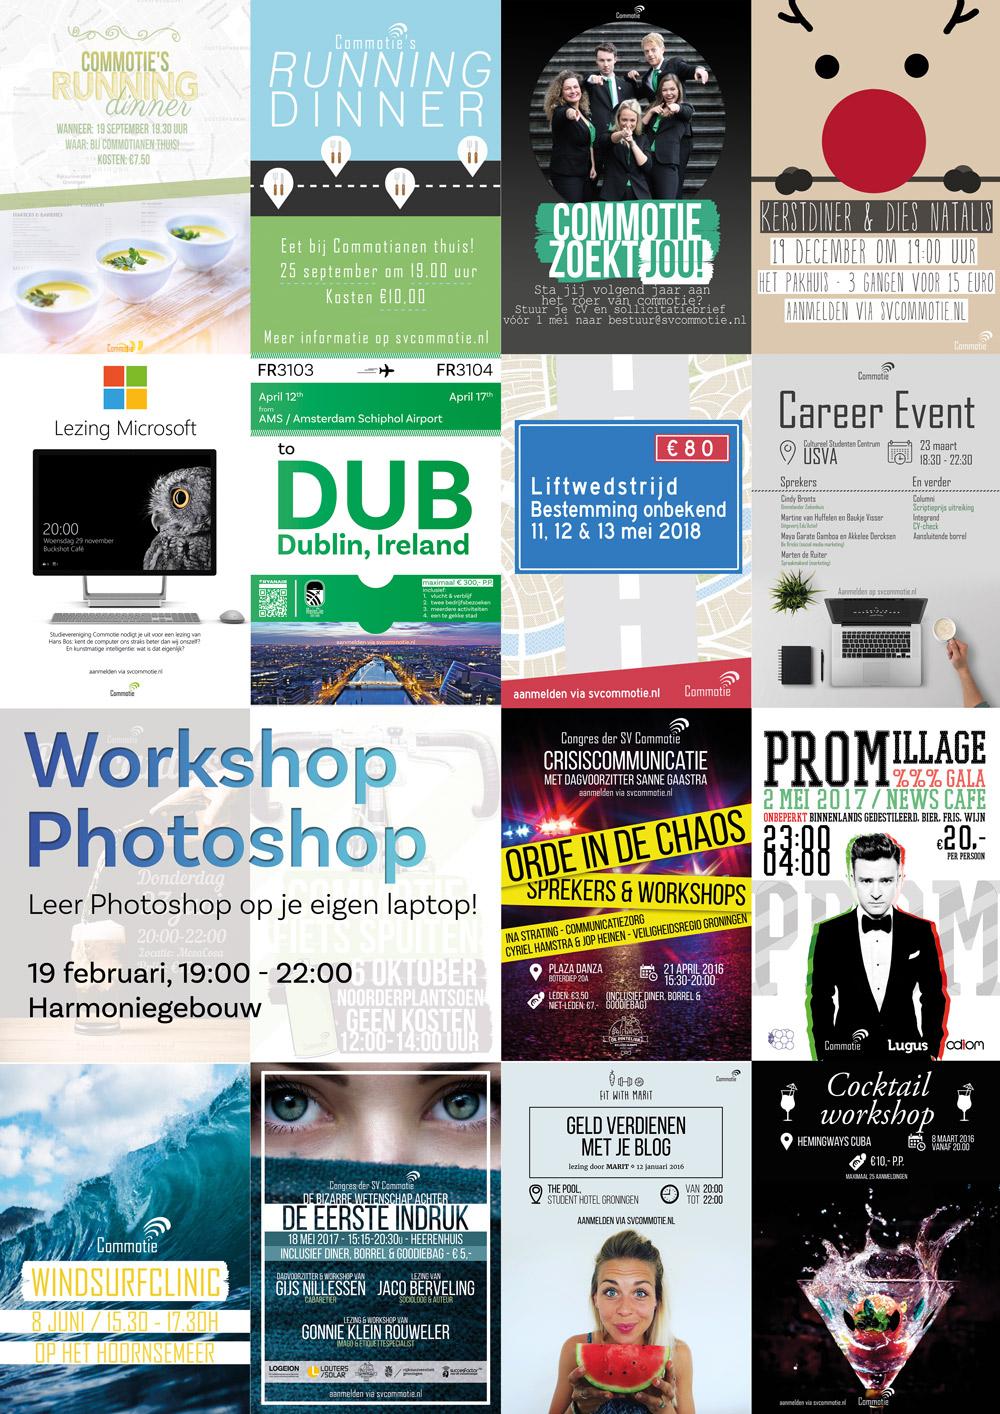 Workshop Photoshop